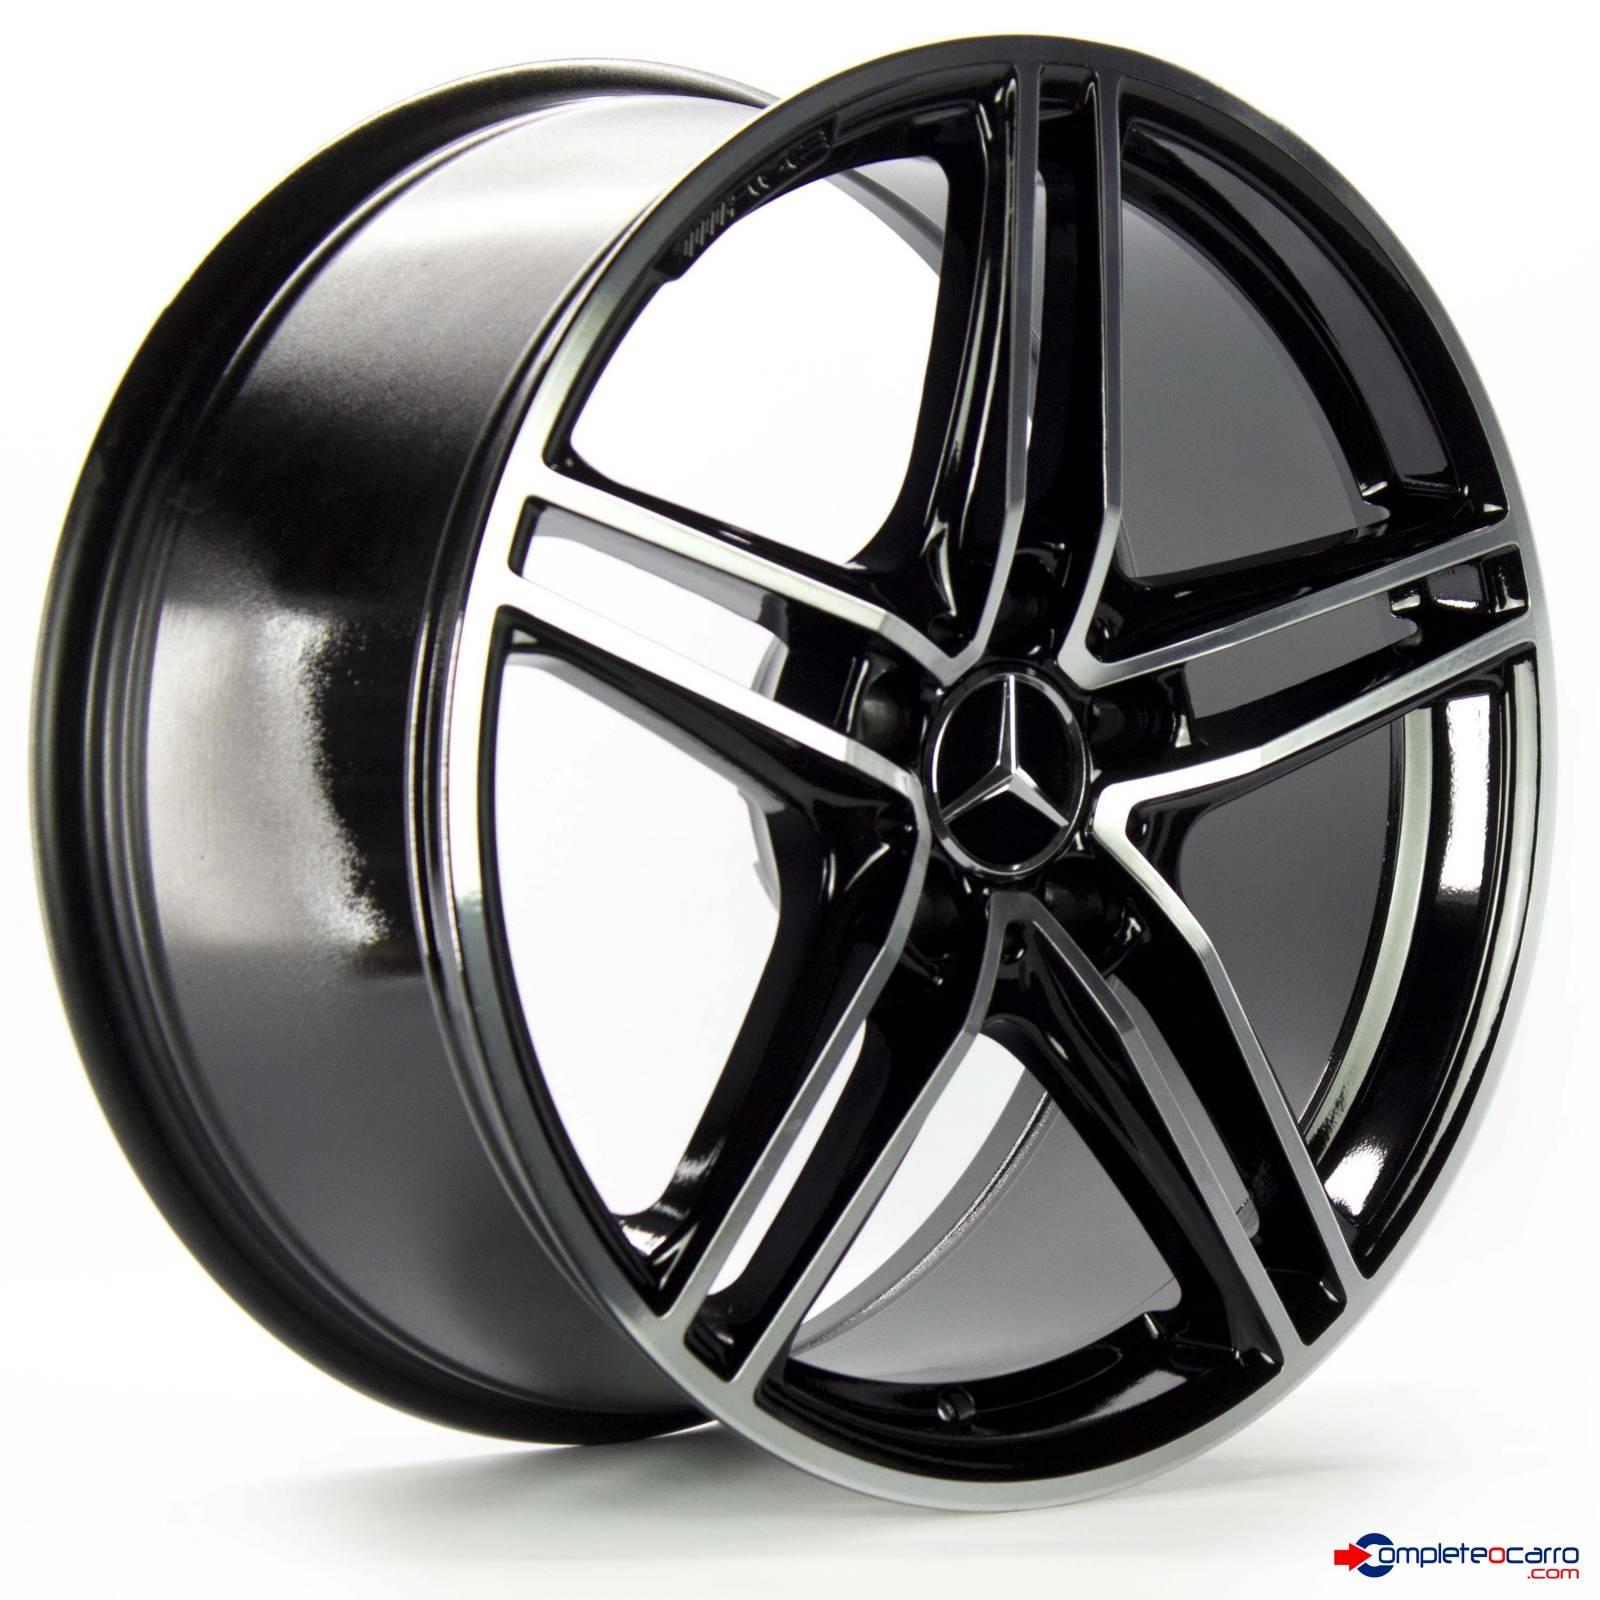 Jogo de Rodas Aro 19' 5x112 Mercedes AMG GT Roadster - DD -